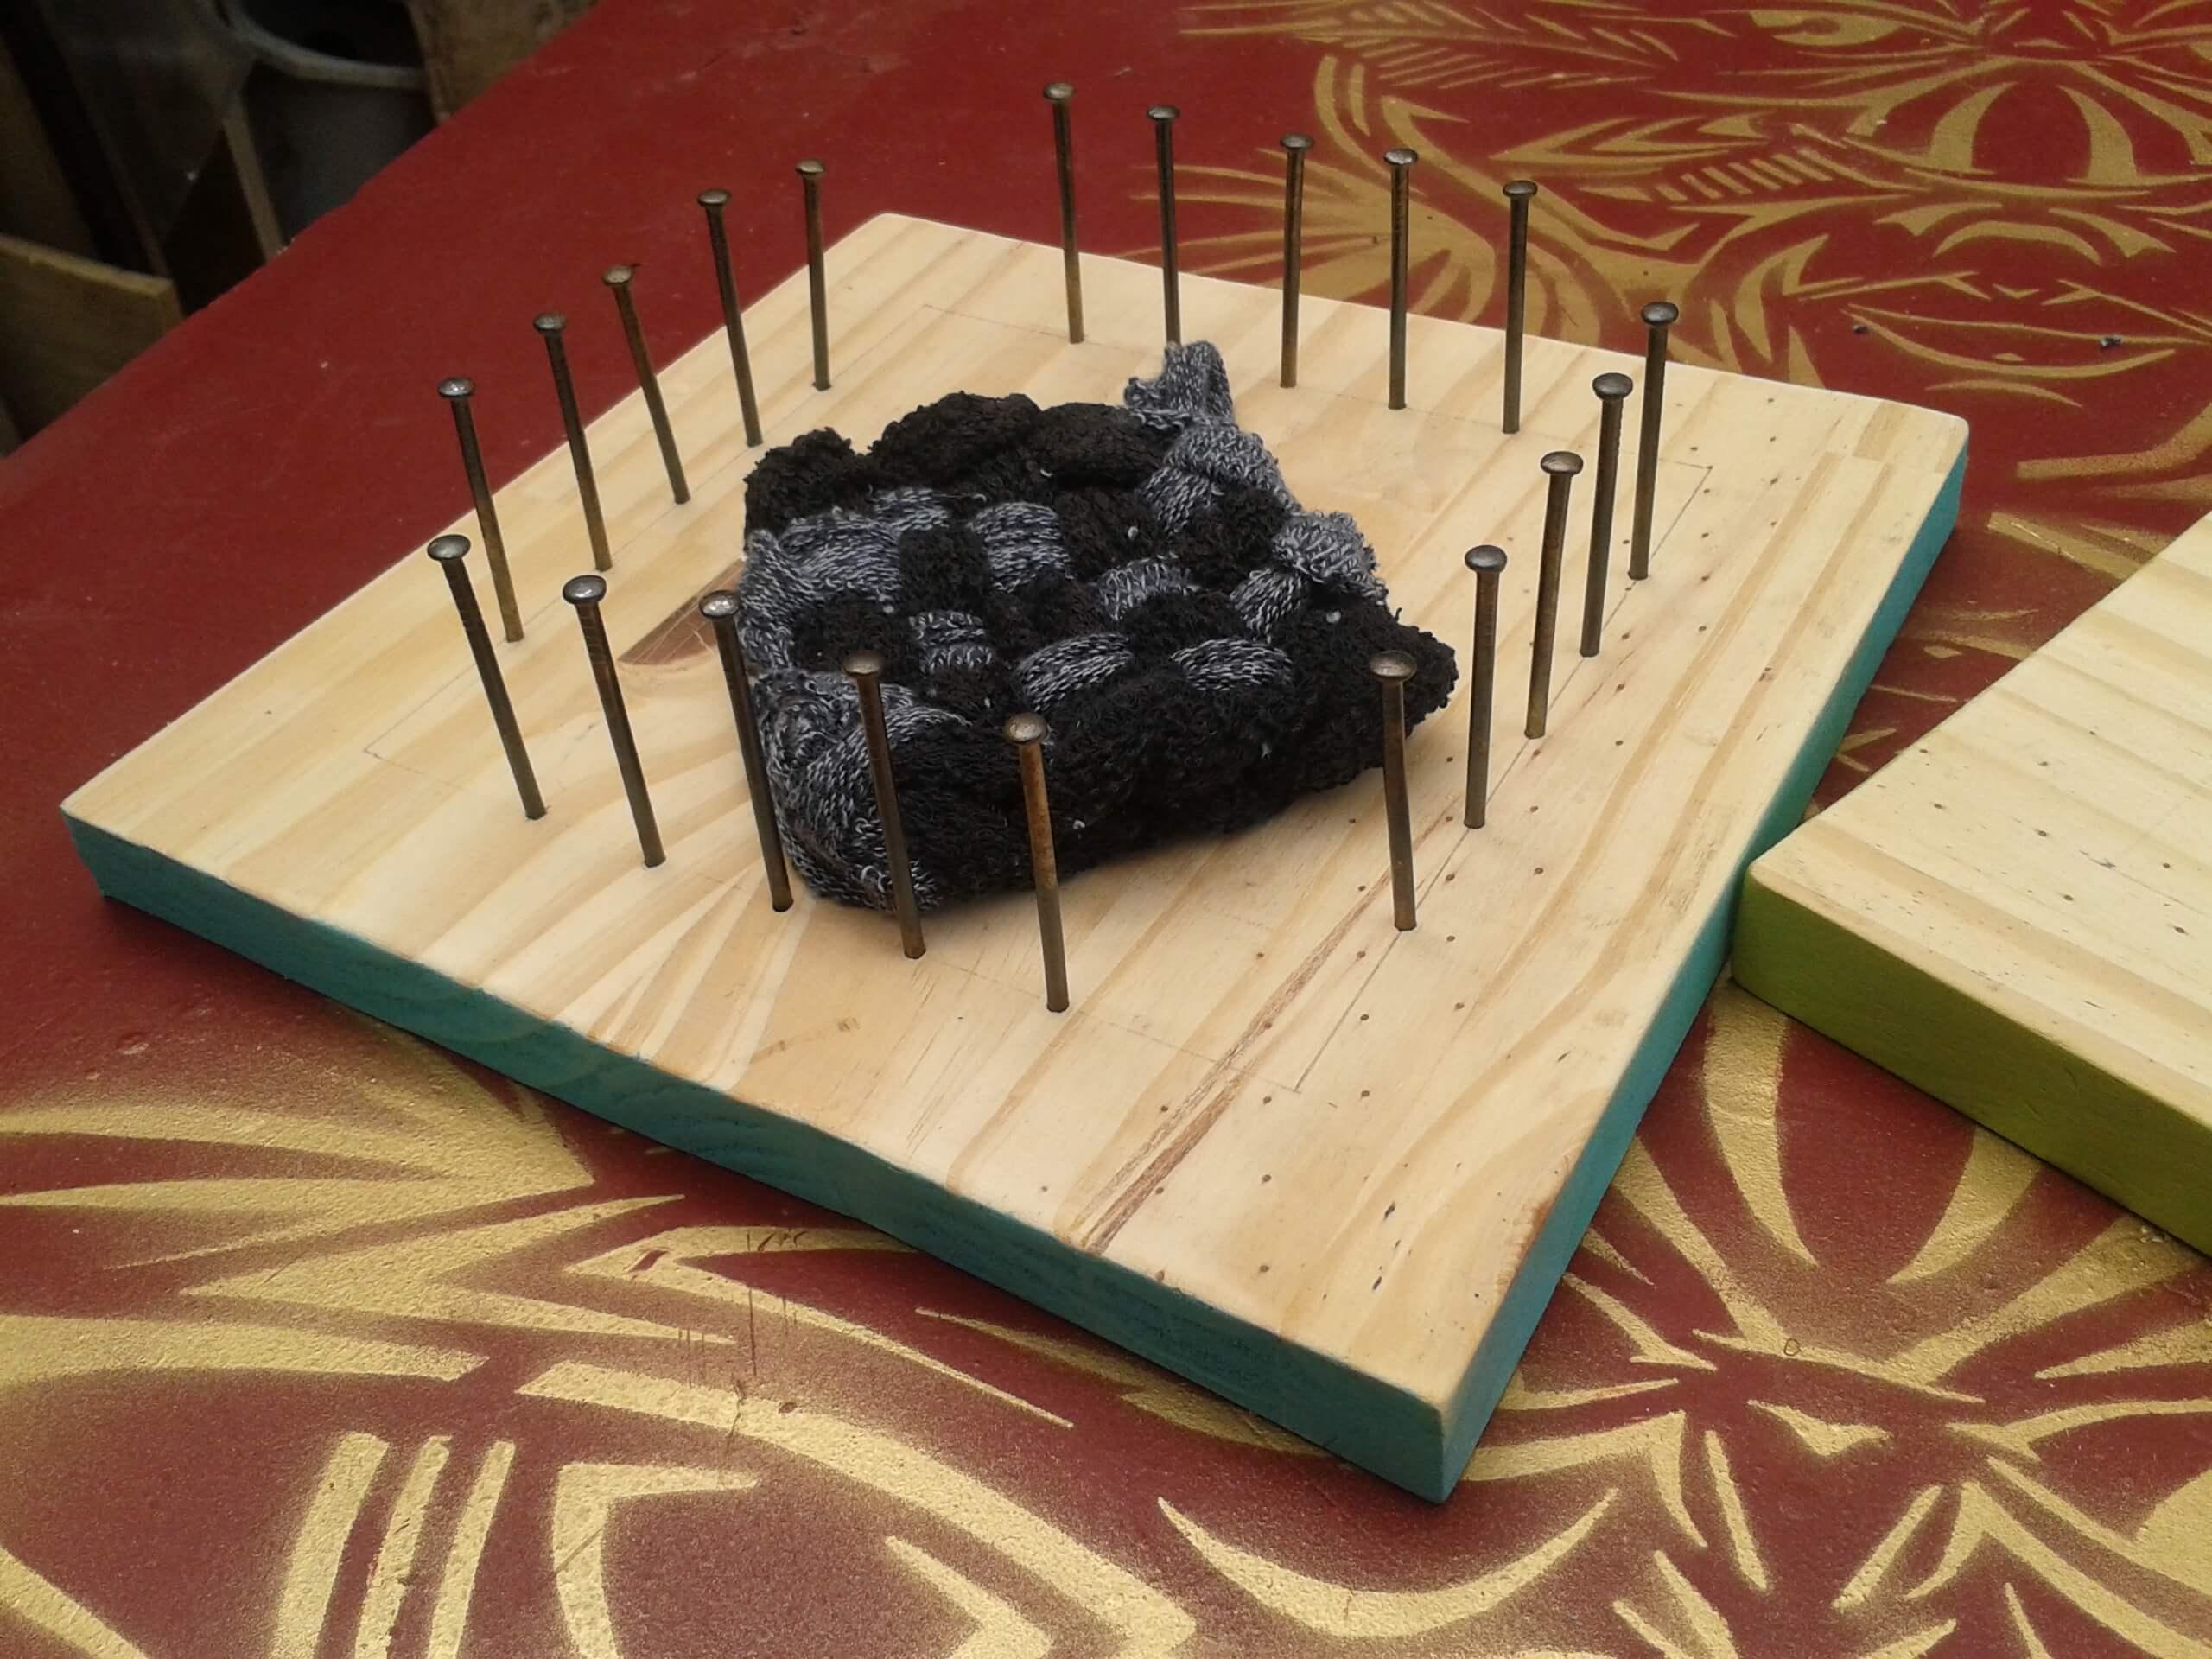 fabriquer son m tier tisser pour tawashi do it yourself lille. Black Bedroom Furniture Sets. Home Design Ideas